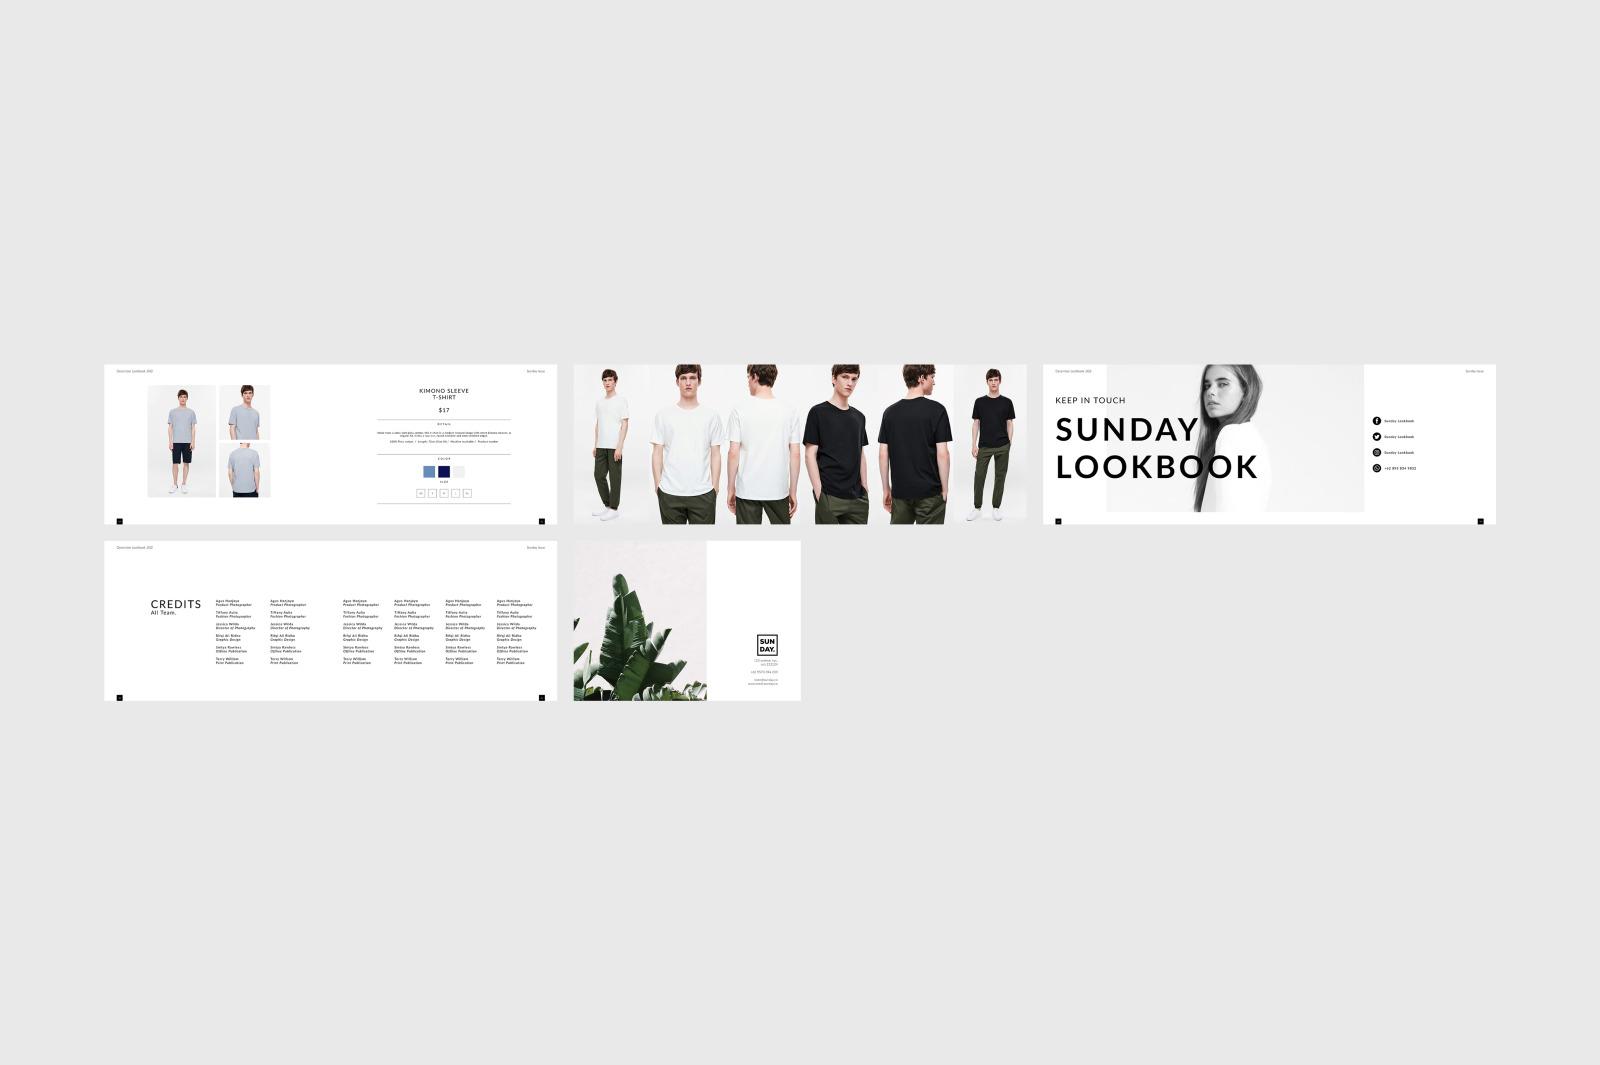 Sunday Lookbook